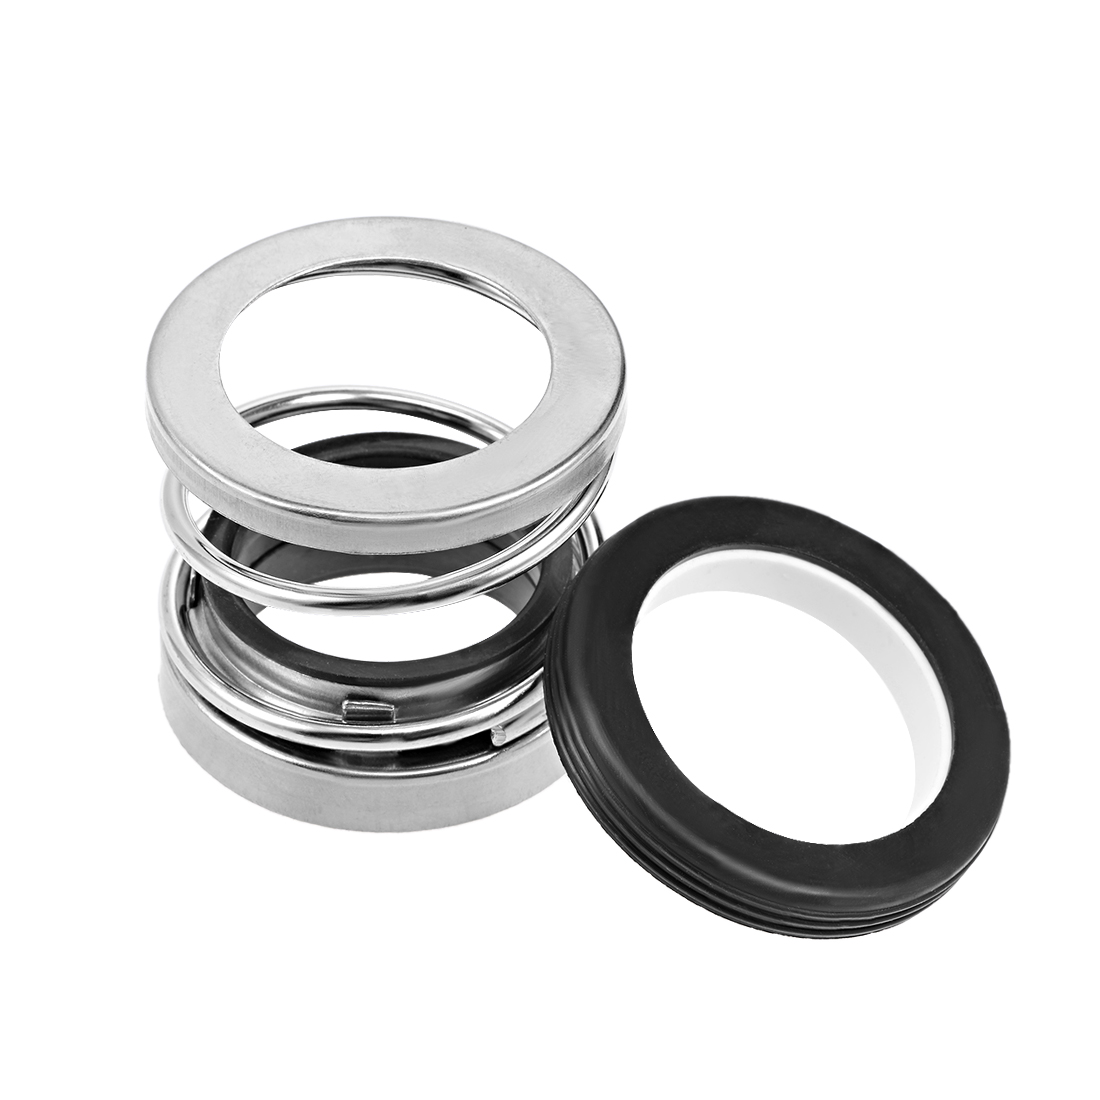 Mechanical Shaft Seal Replacement for Pool Spa Pump 2pcs 108-30 - image 1 de 4